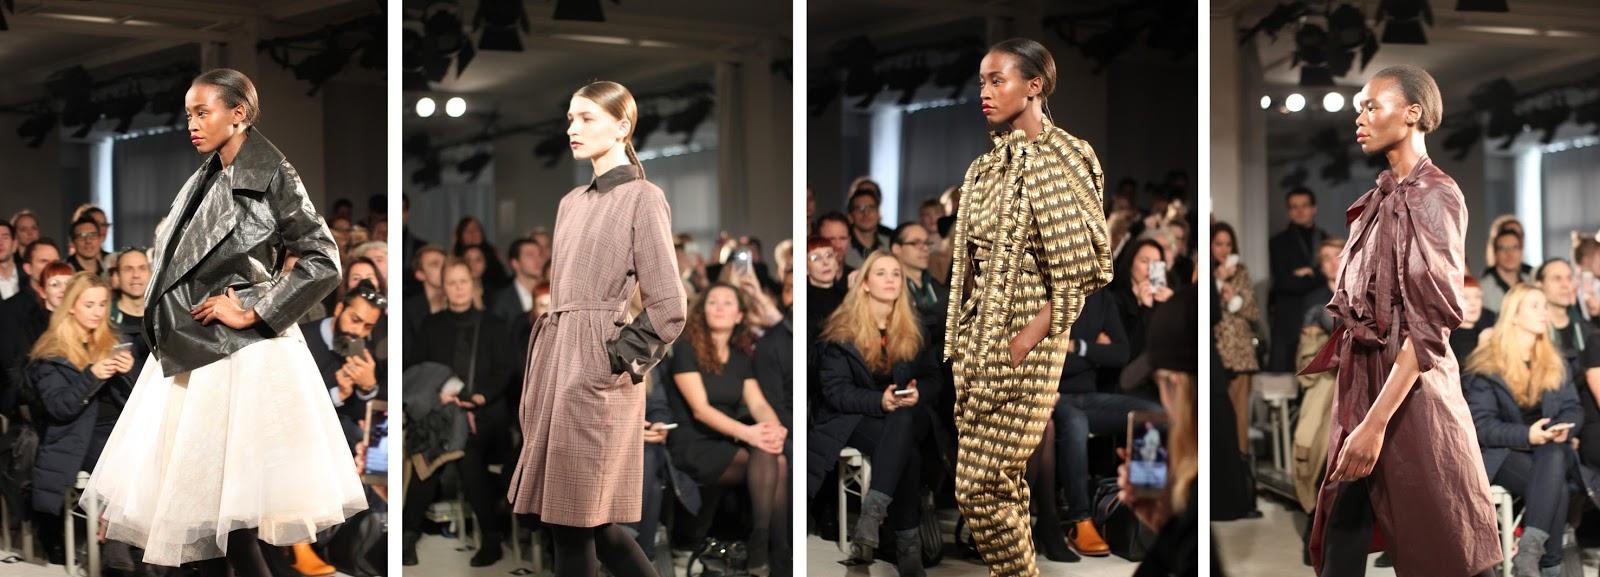 berlin fashion week 2017 neulinge